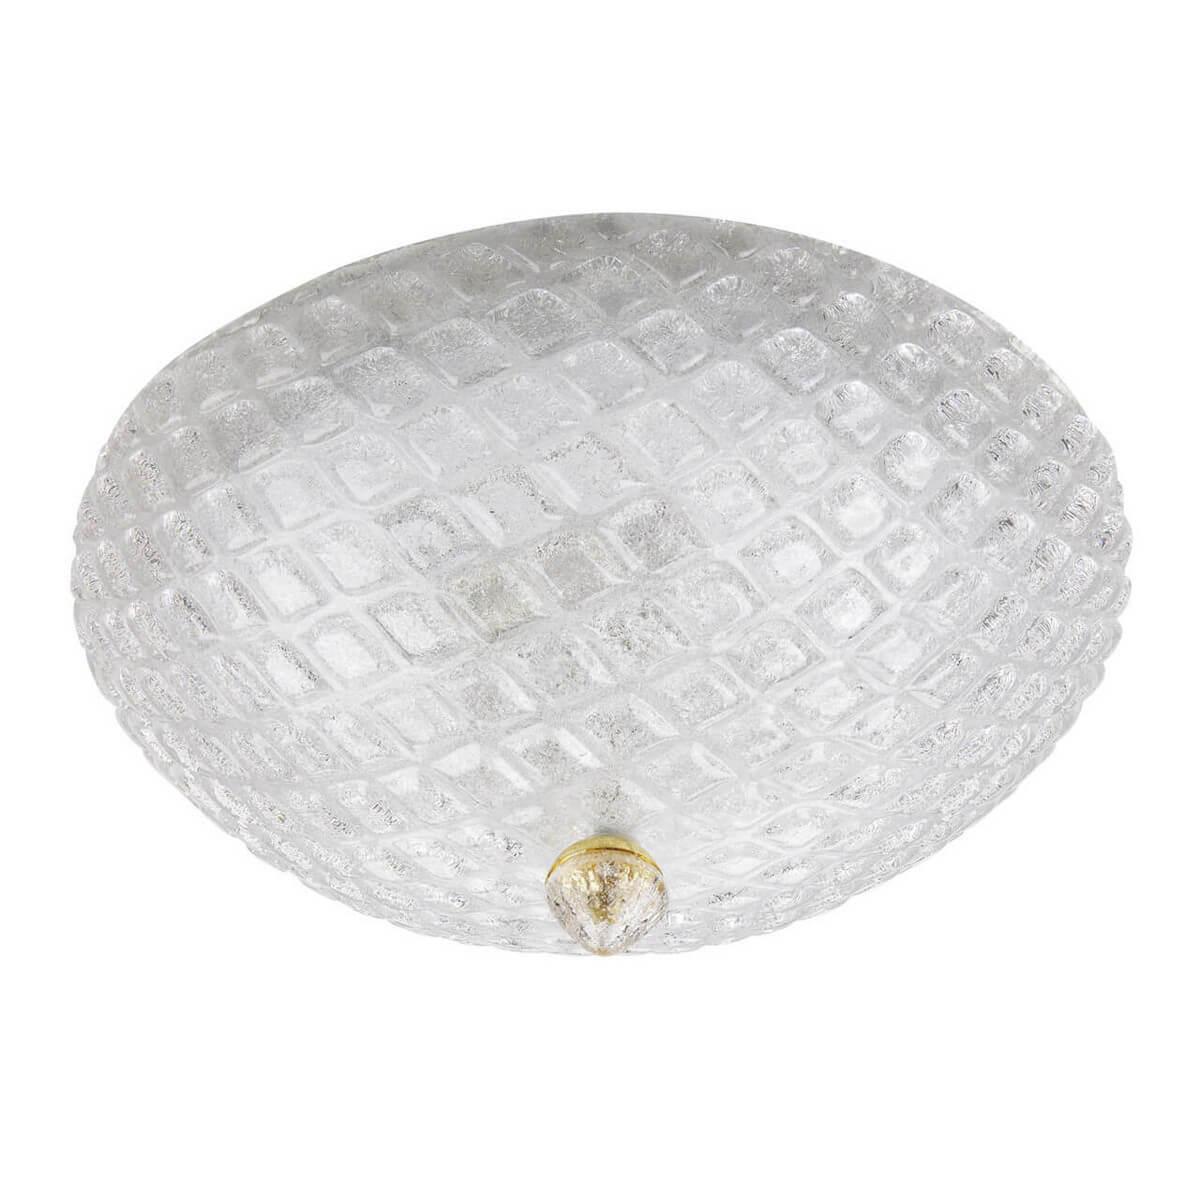 Потолочный светильник Lightstar 602070, E14, 40 Вт lightstar 214316